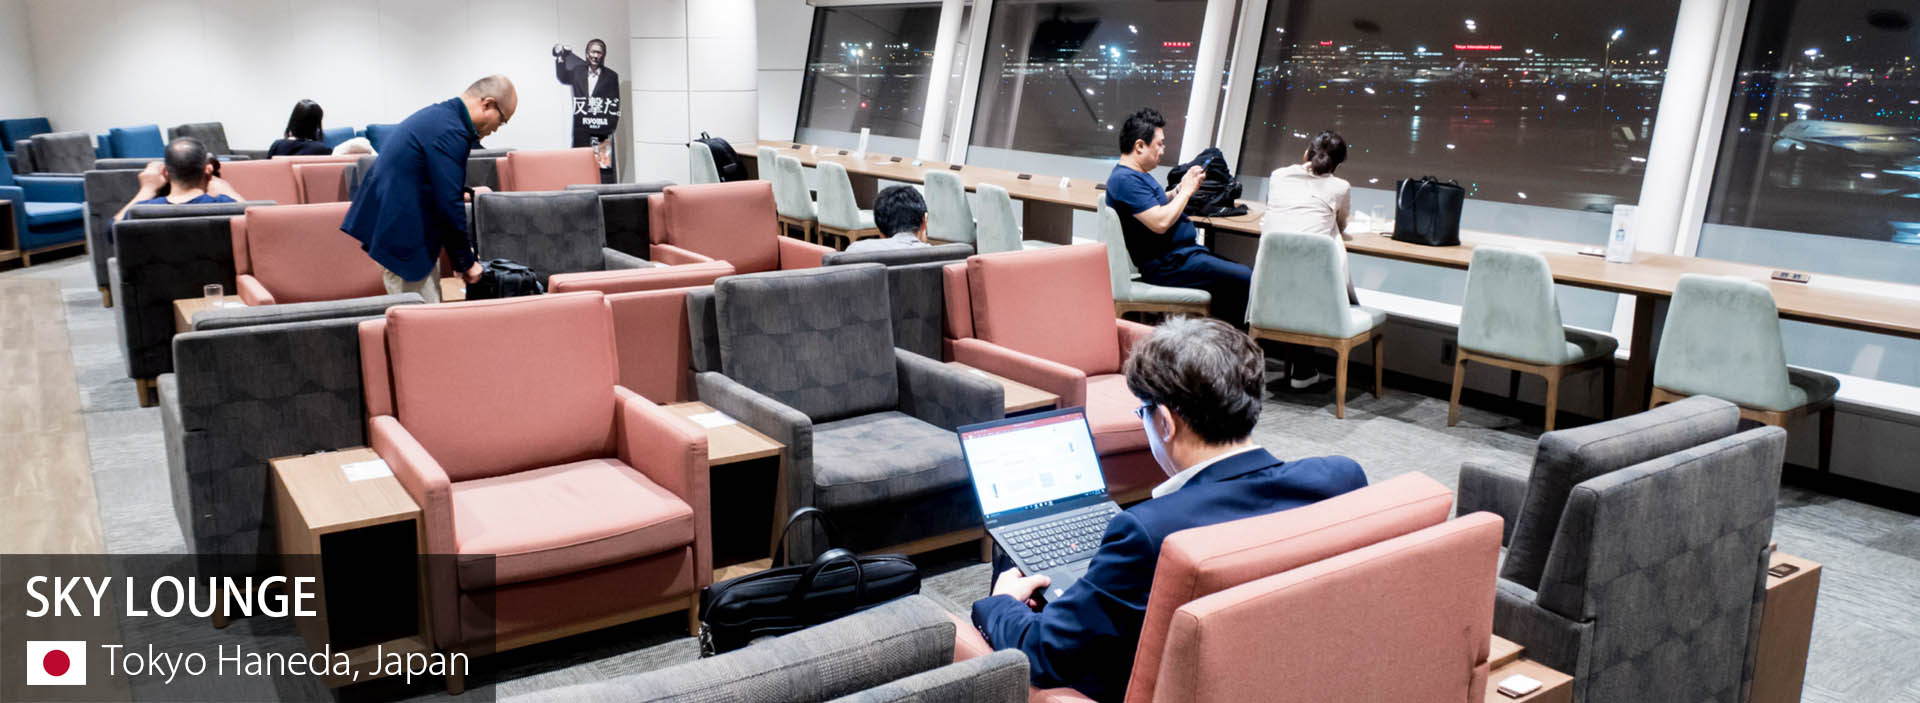 Lounge Review: SKY LOUNGE at Tokyo Haneda